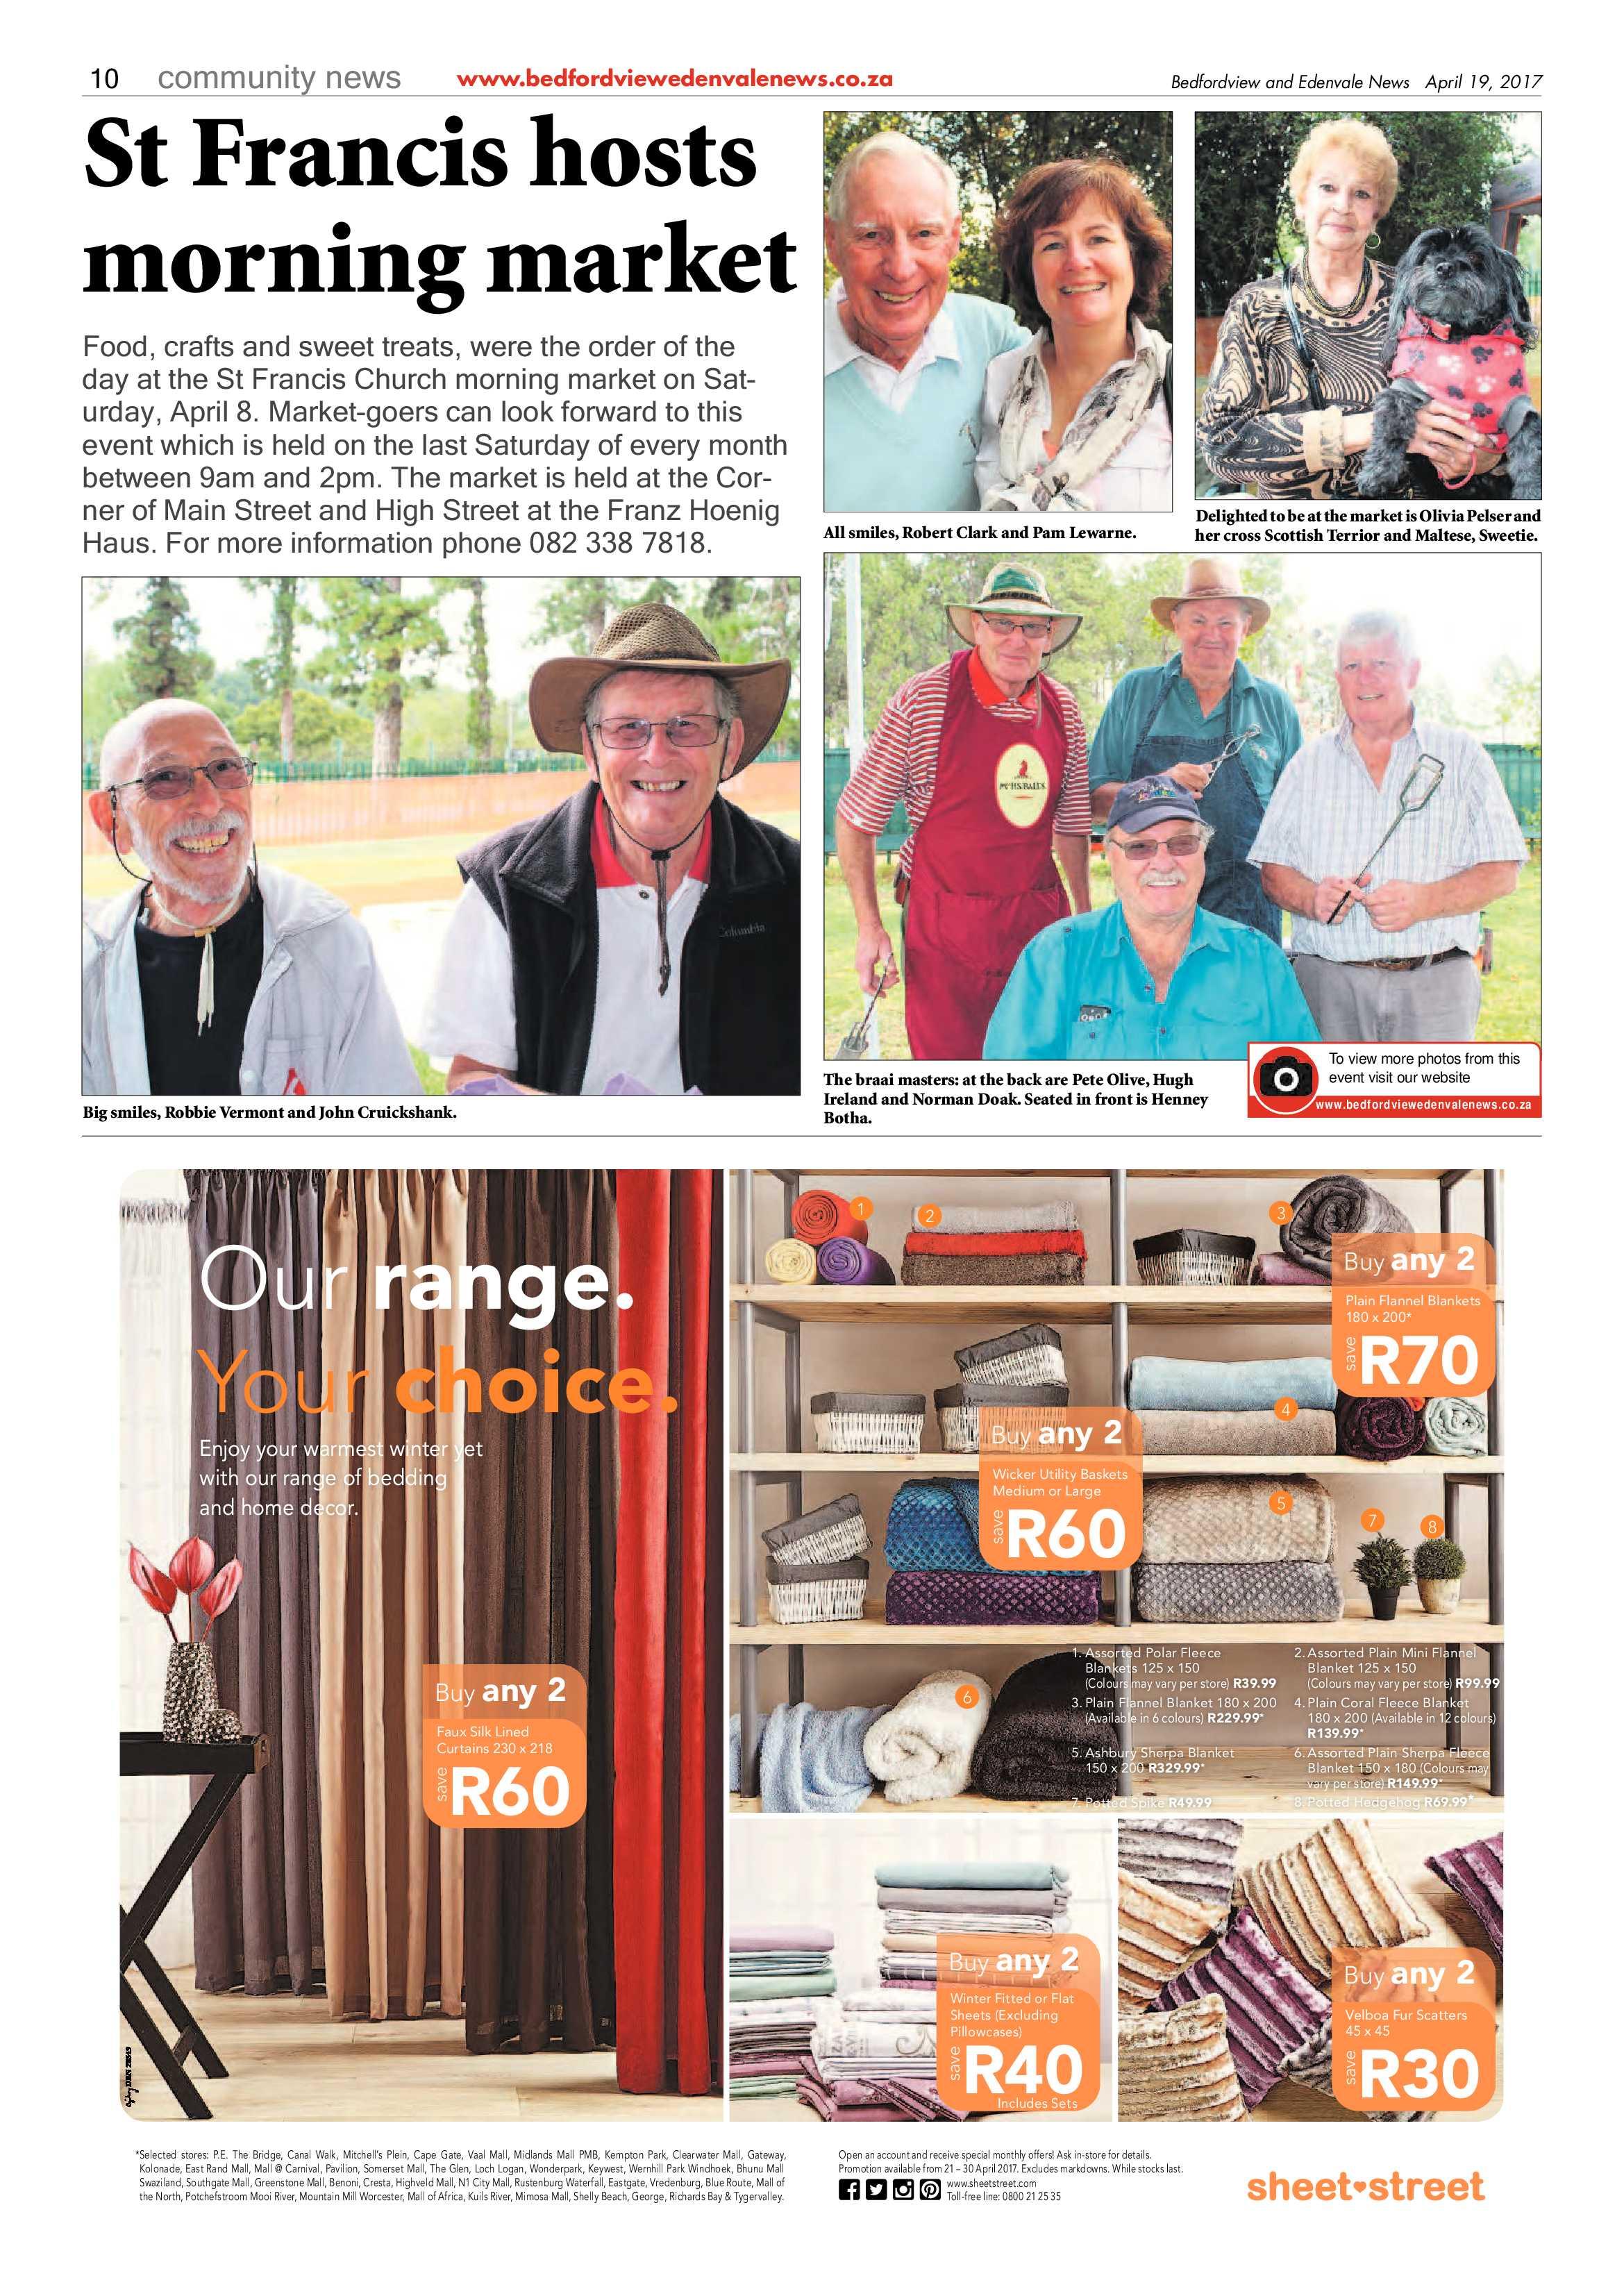 bedfordview-edenvale-news-19-april-2017-epapers-page-10